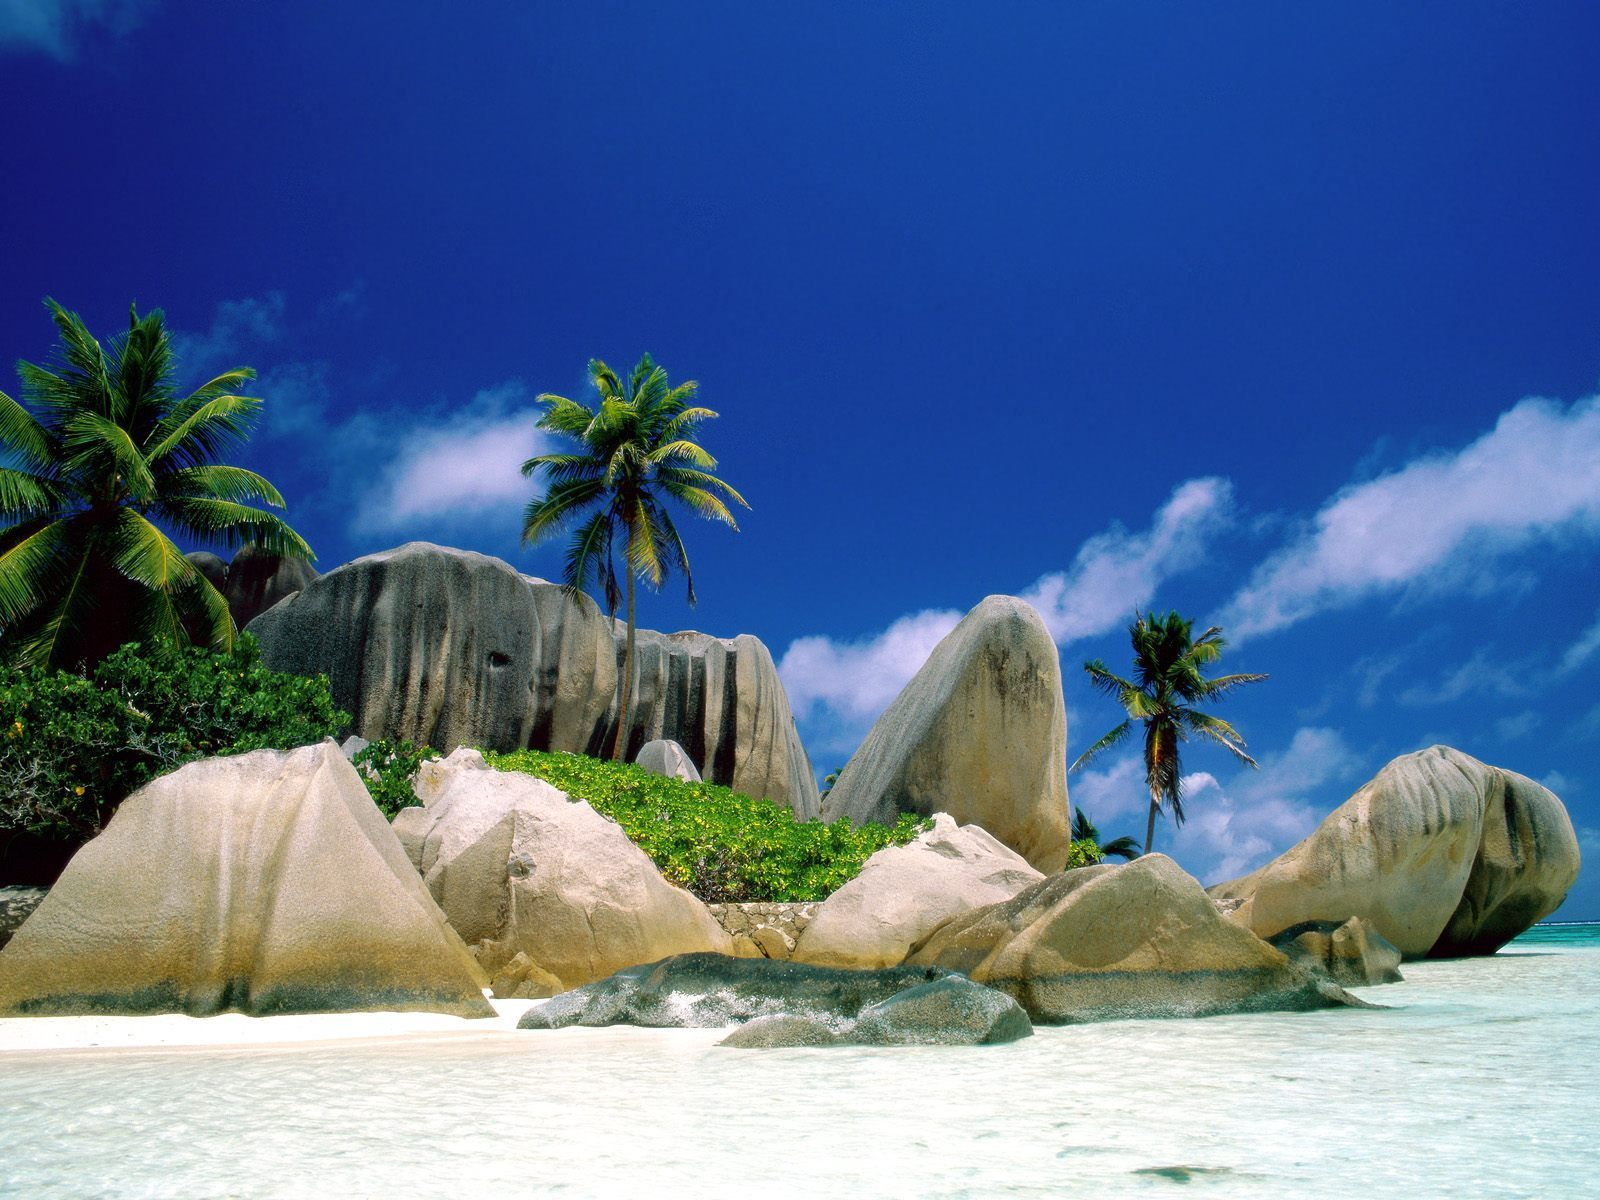 La-Digue-Islands.jpg (1600×1200)